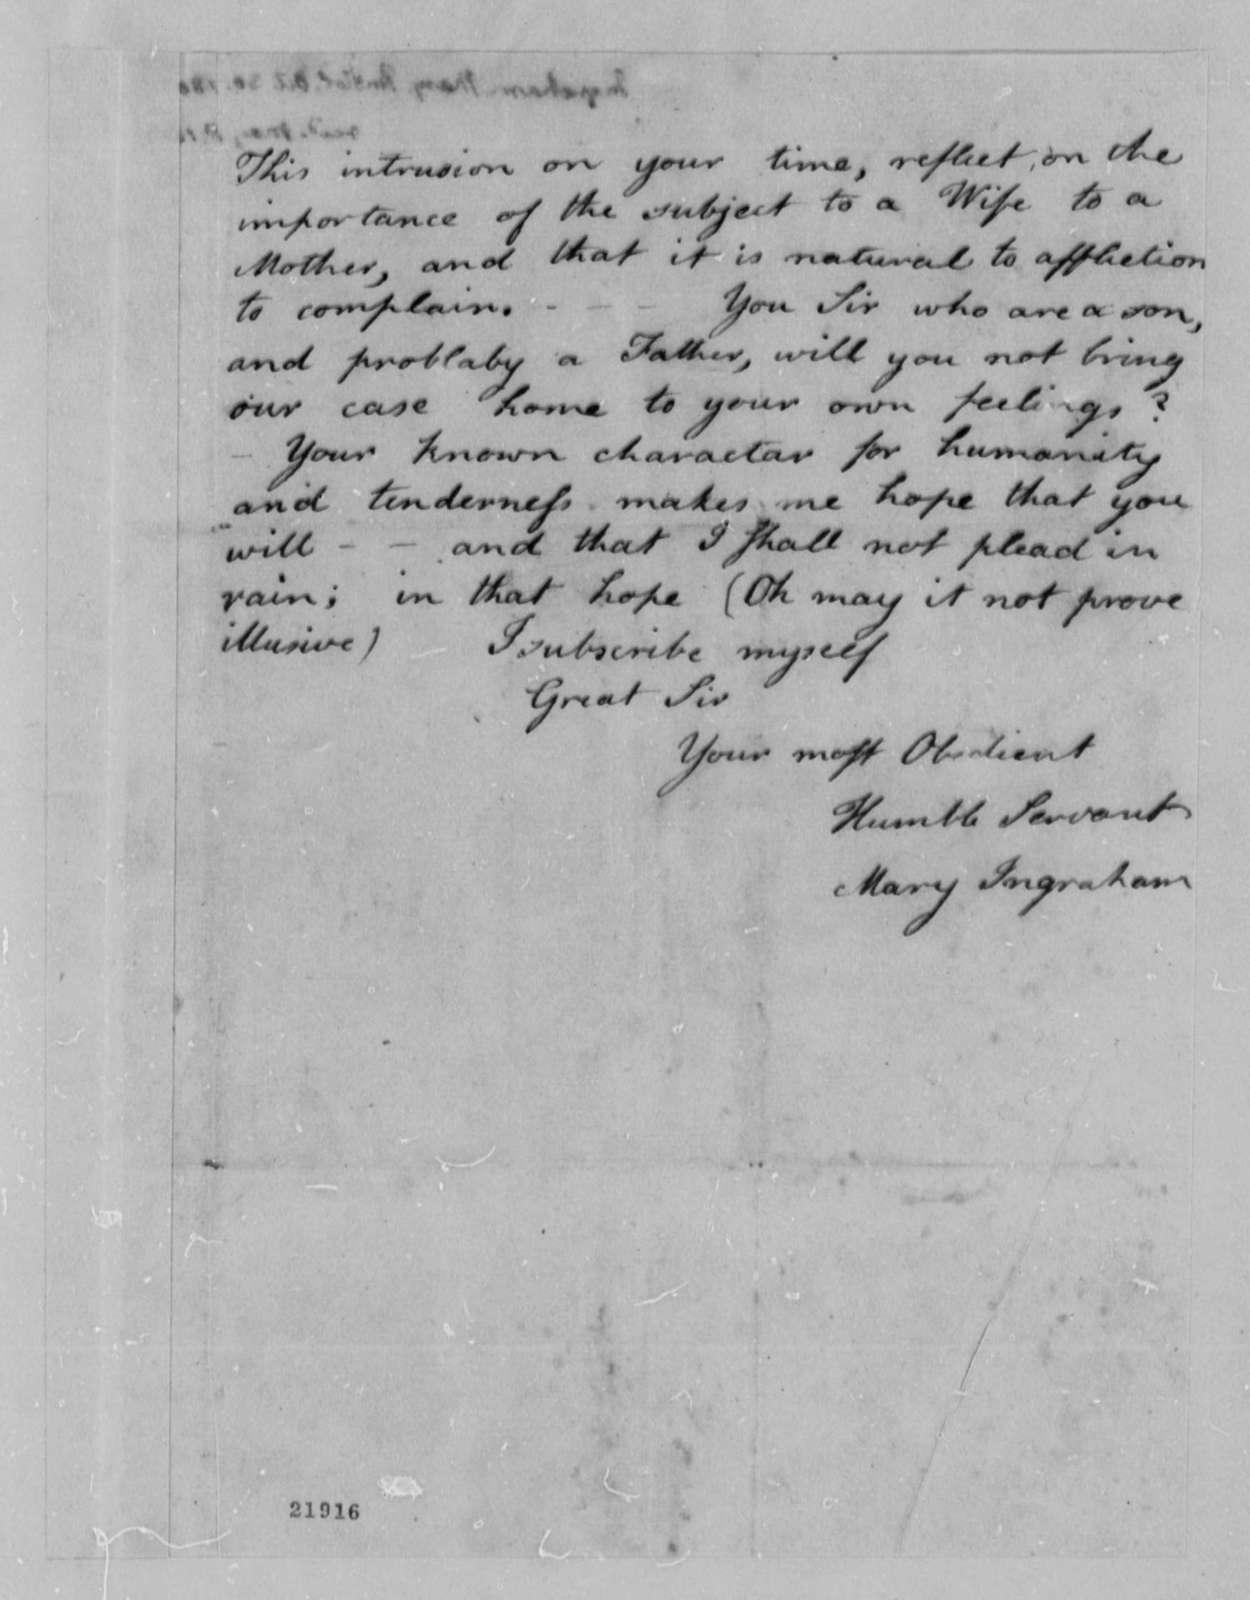 Mary Ingraham to Thomas Jefferson, October 30, 1802